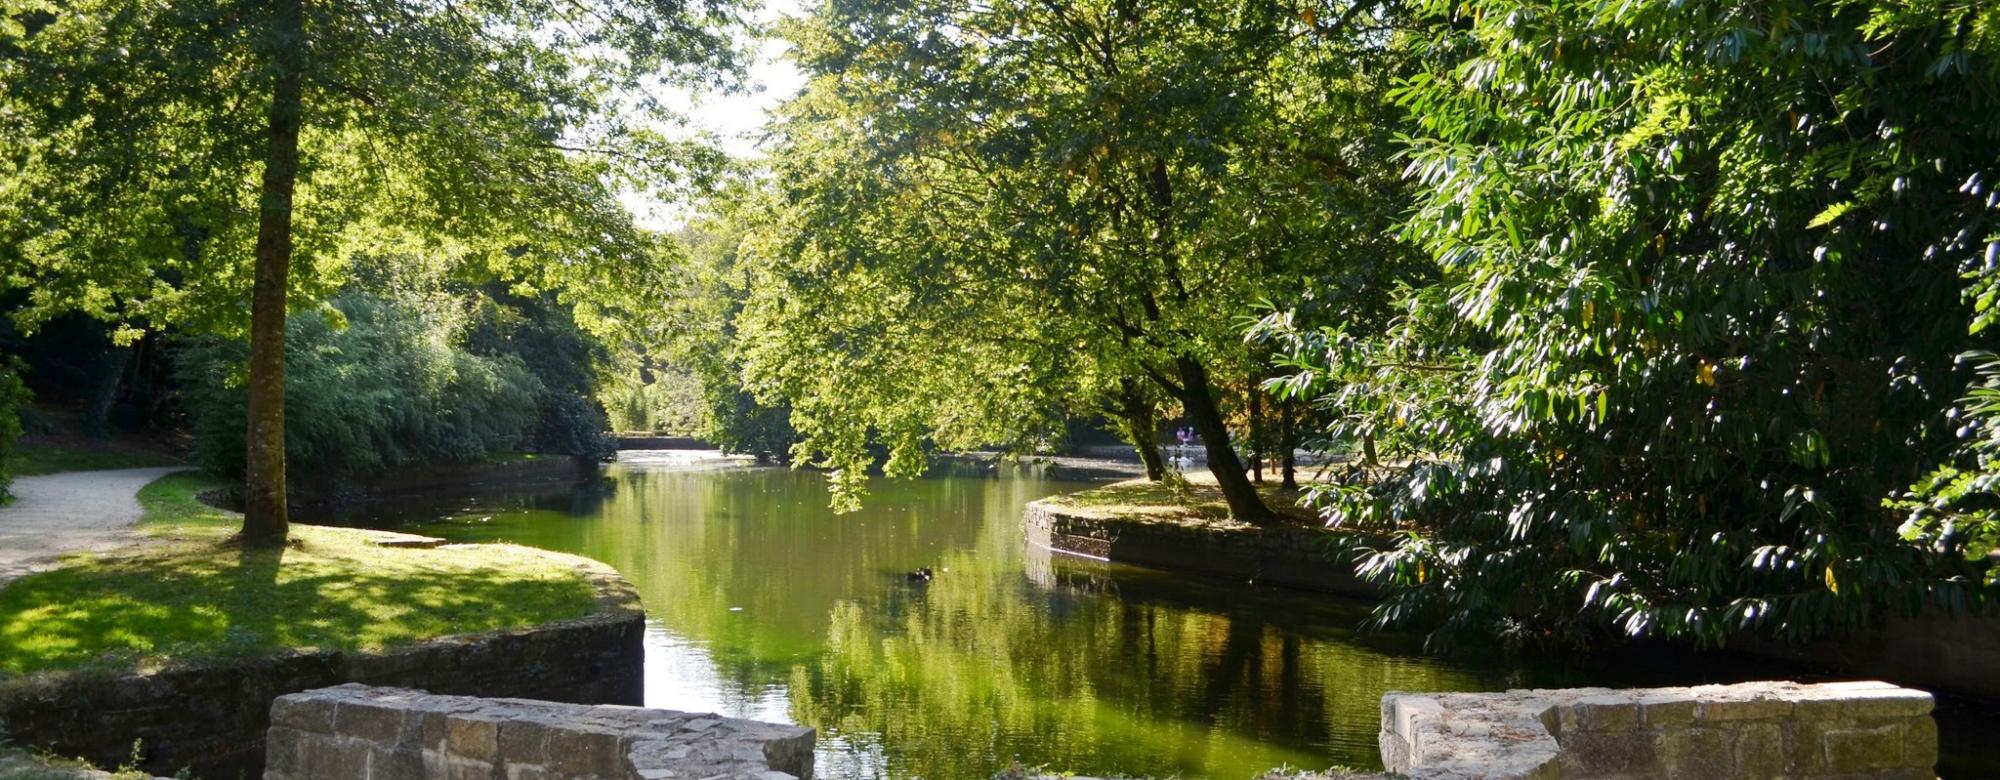 Hennebont, l'étang du Parc de Kerbihan